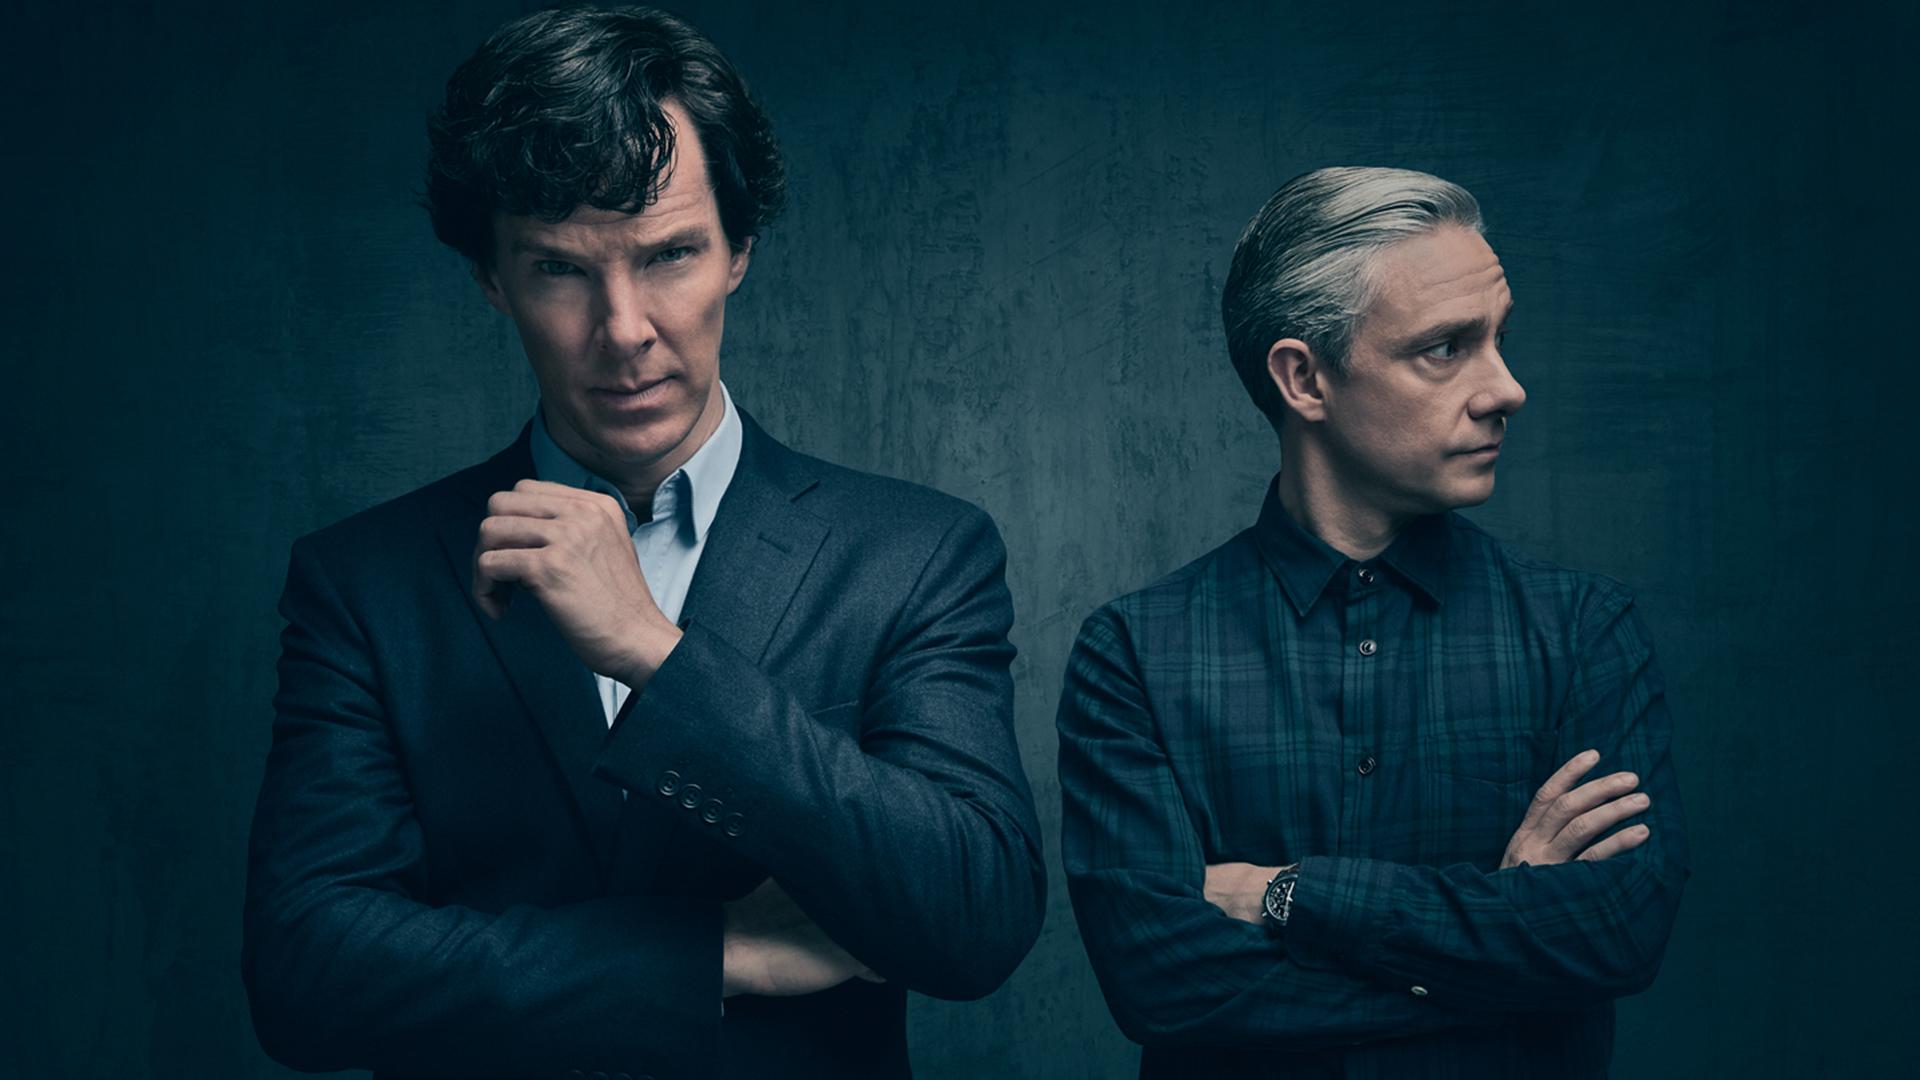 Sherlock Holmes and John Watson: Official Season 4 photo.